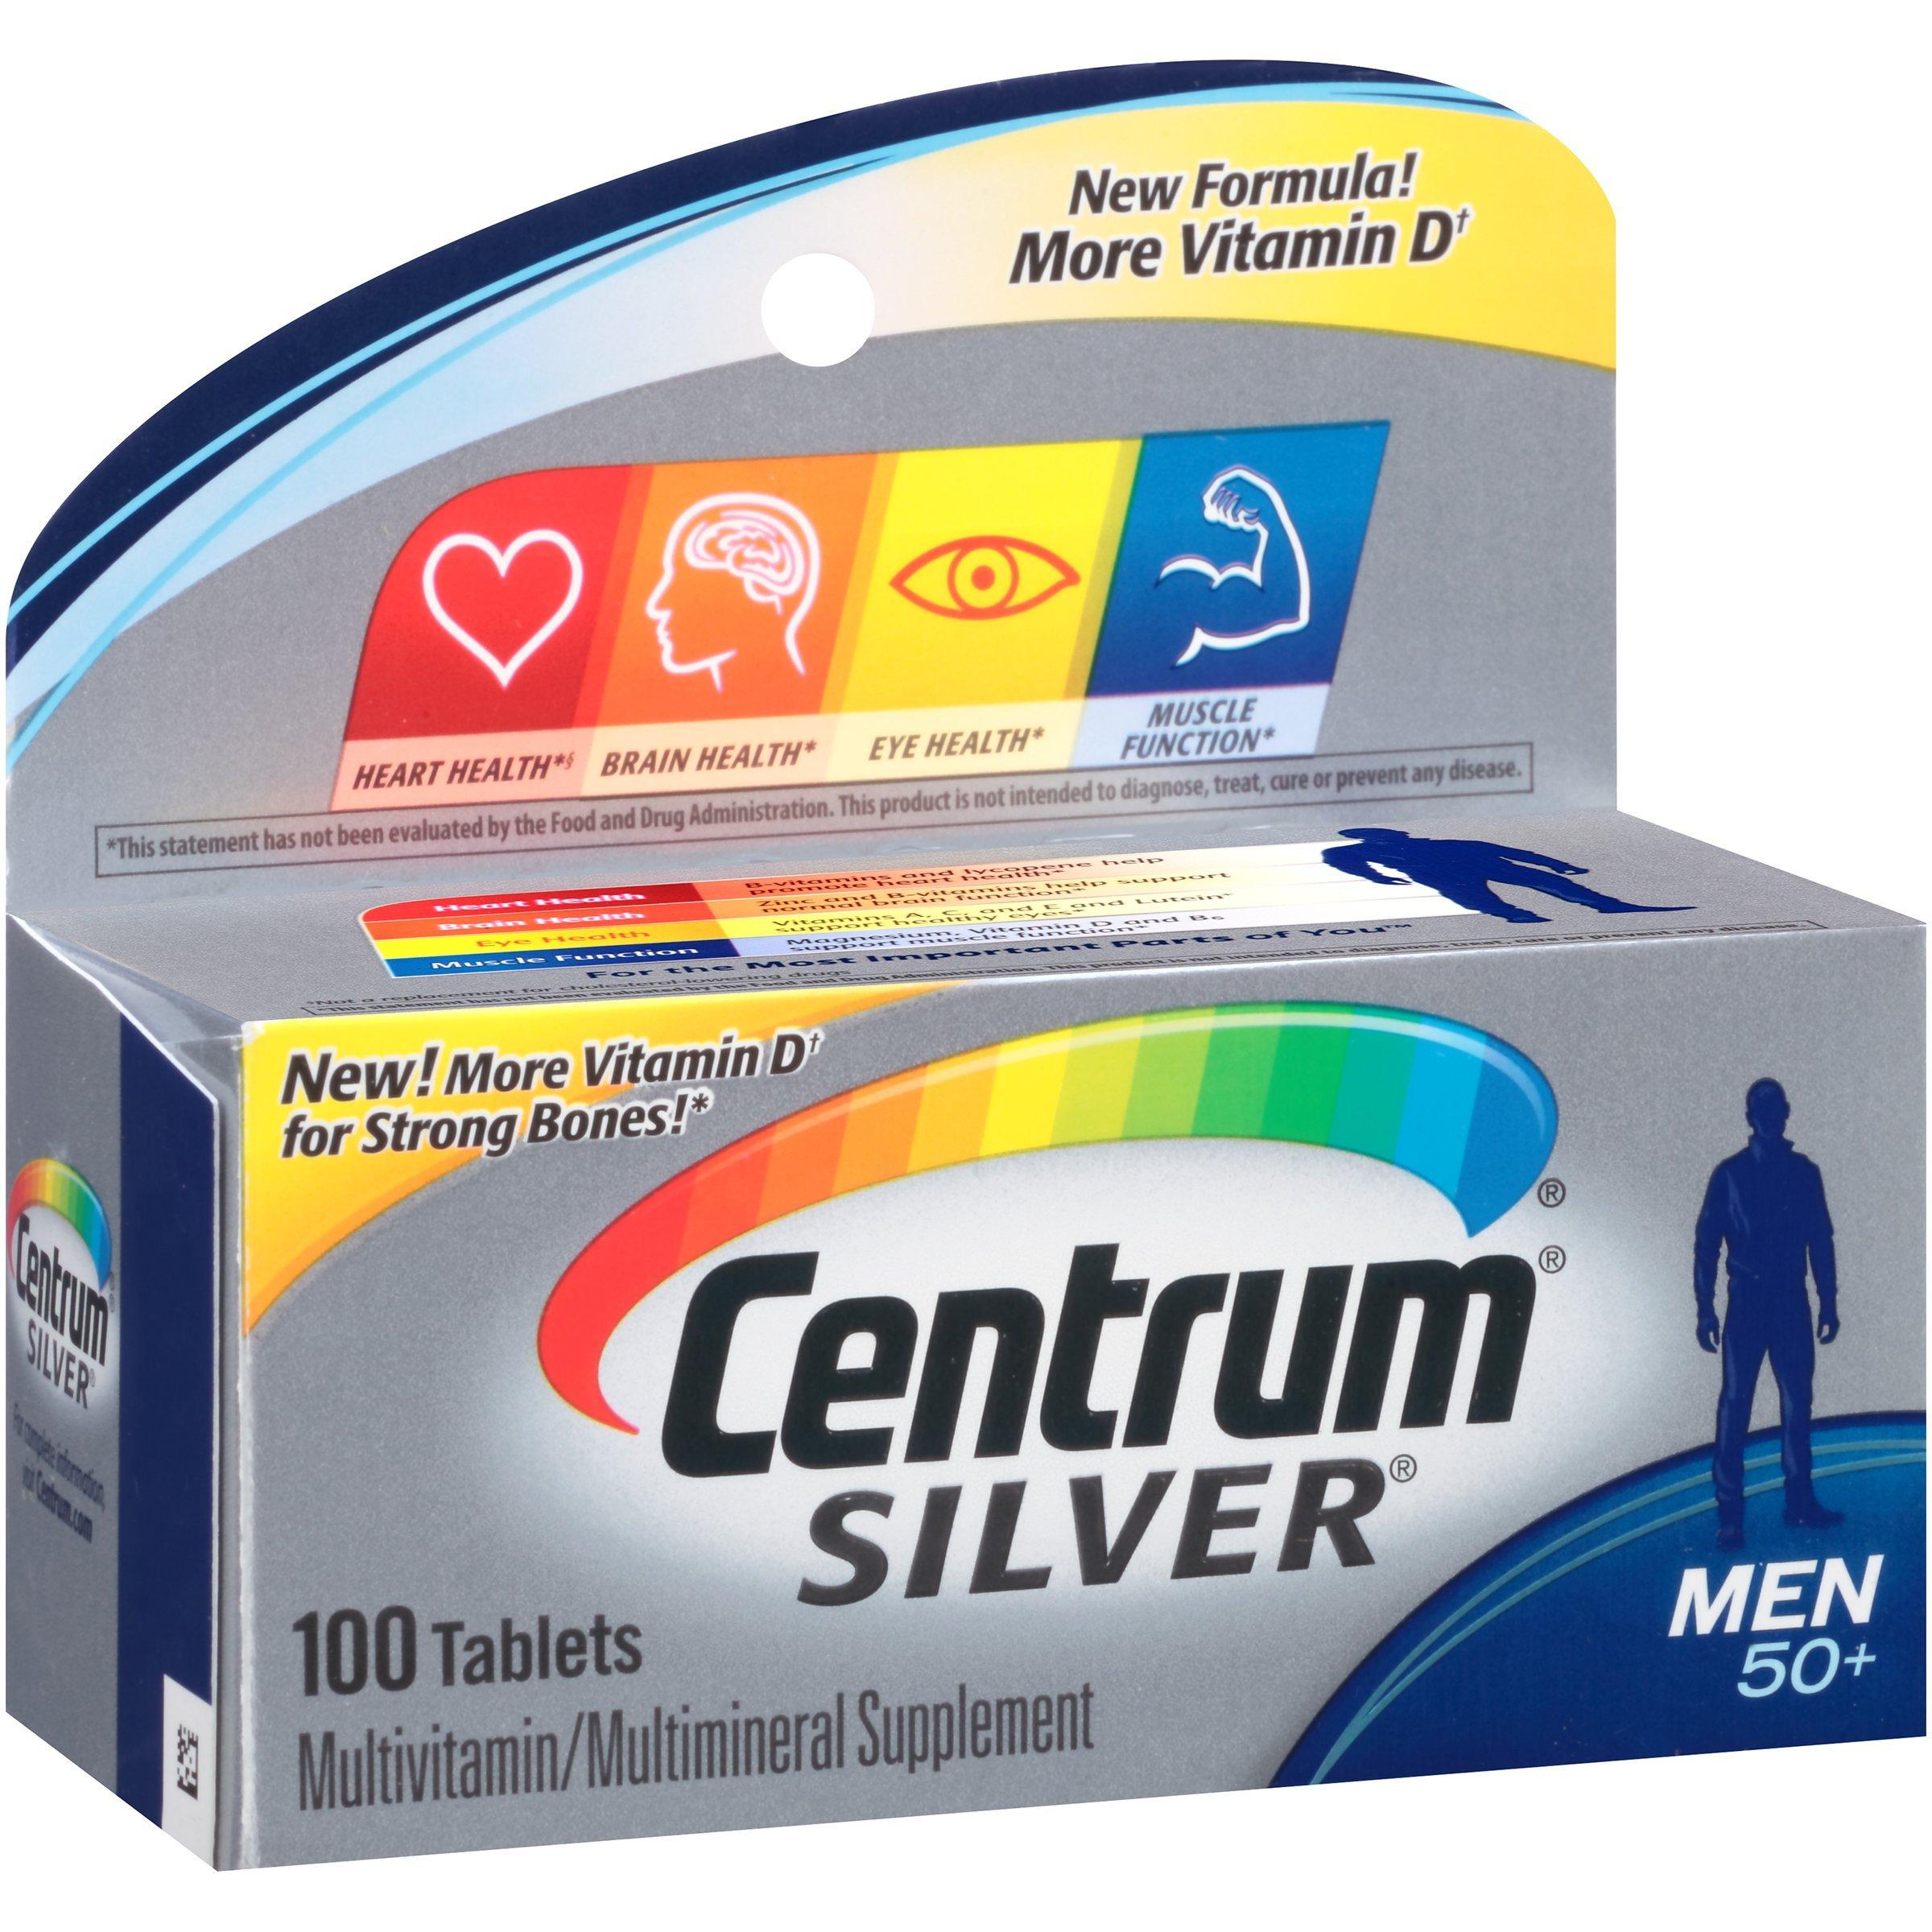 Amazon.com: Centrum Silver Men (100 Count) Multivitamin / Multimineral  Supplement Tablet, Vitamin D3, Age 50+: Health & Personal Care